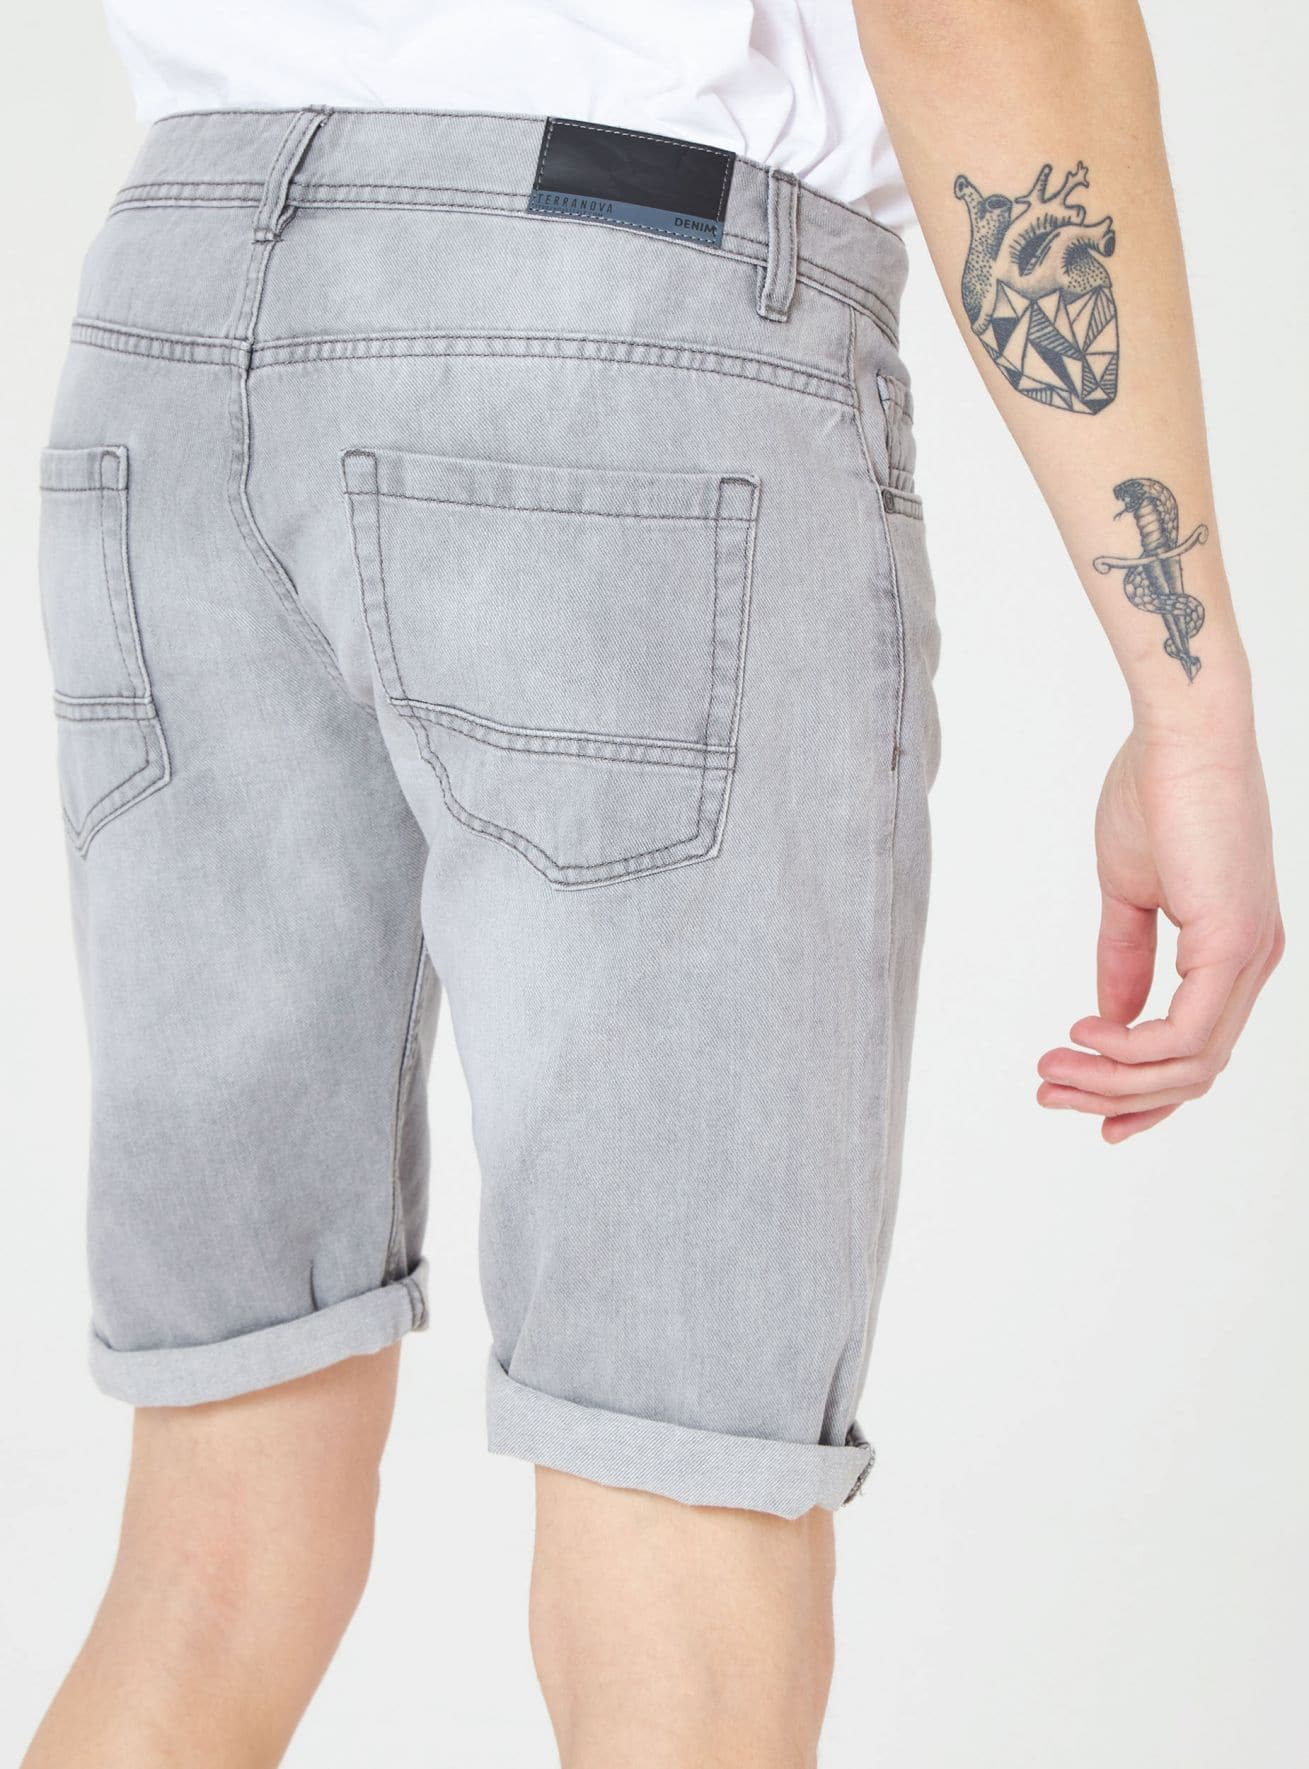 Pantalone Jeans Corto Uomo Terranova